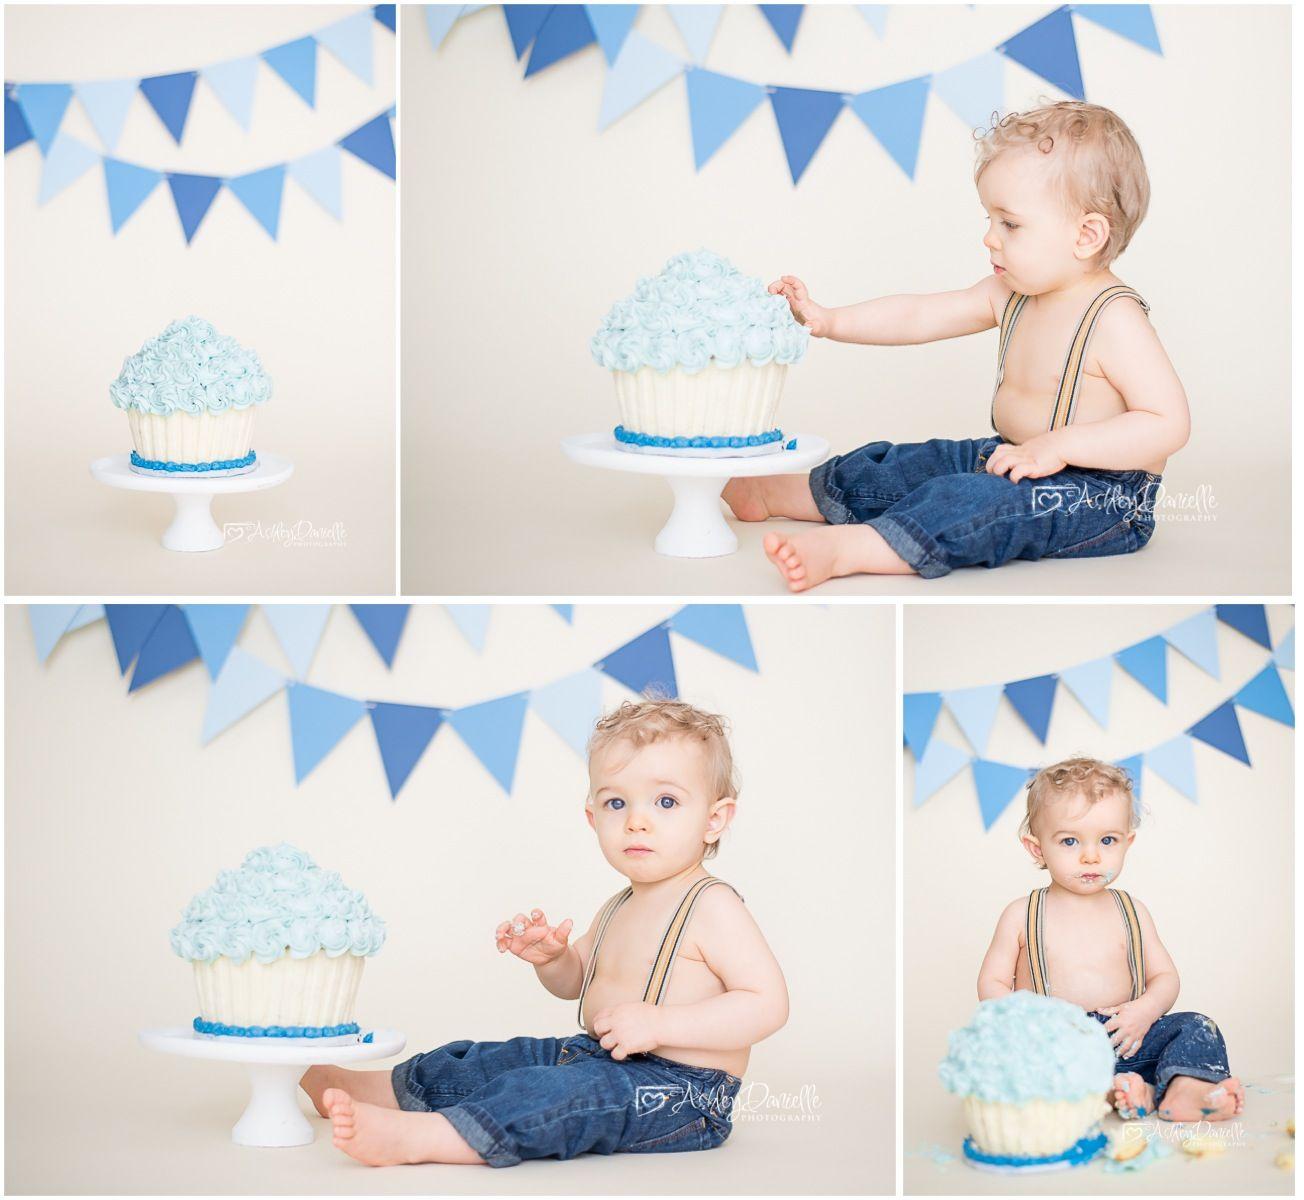 Boy cake smash session, blue and white cake smash, cake smash and splash photo, simple cake smash photo shoot, giant cupcake cake, Ashley Danielle Photography: Seattle Baby Photographer | Maple Valley, WA